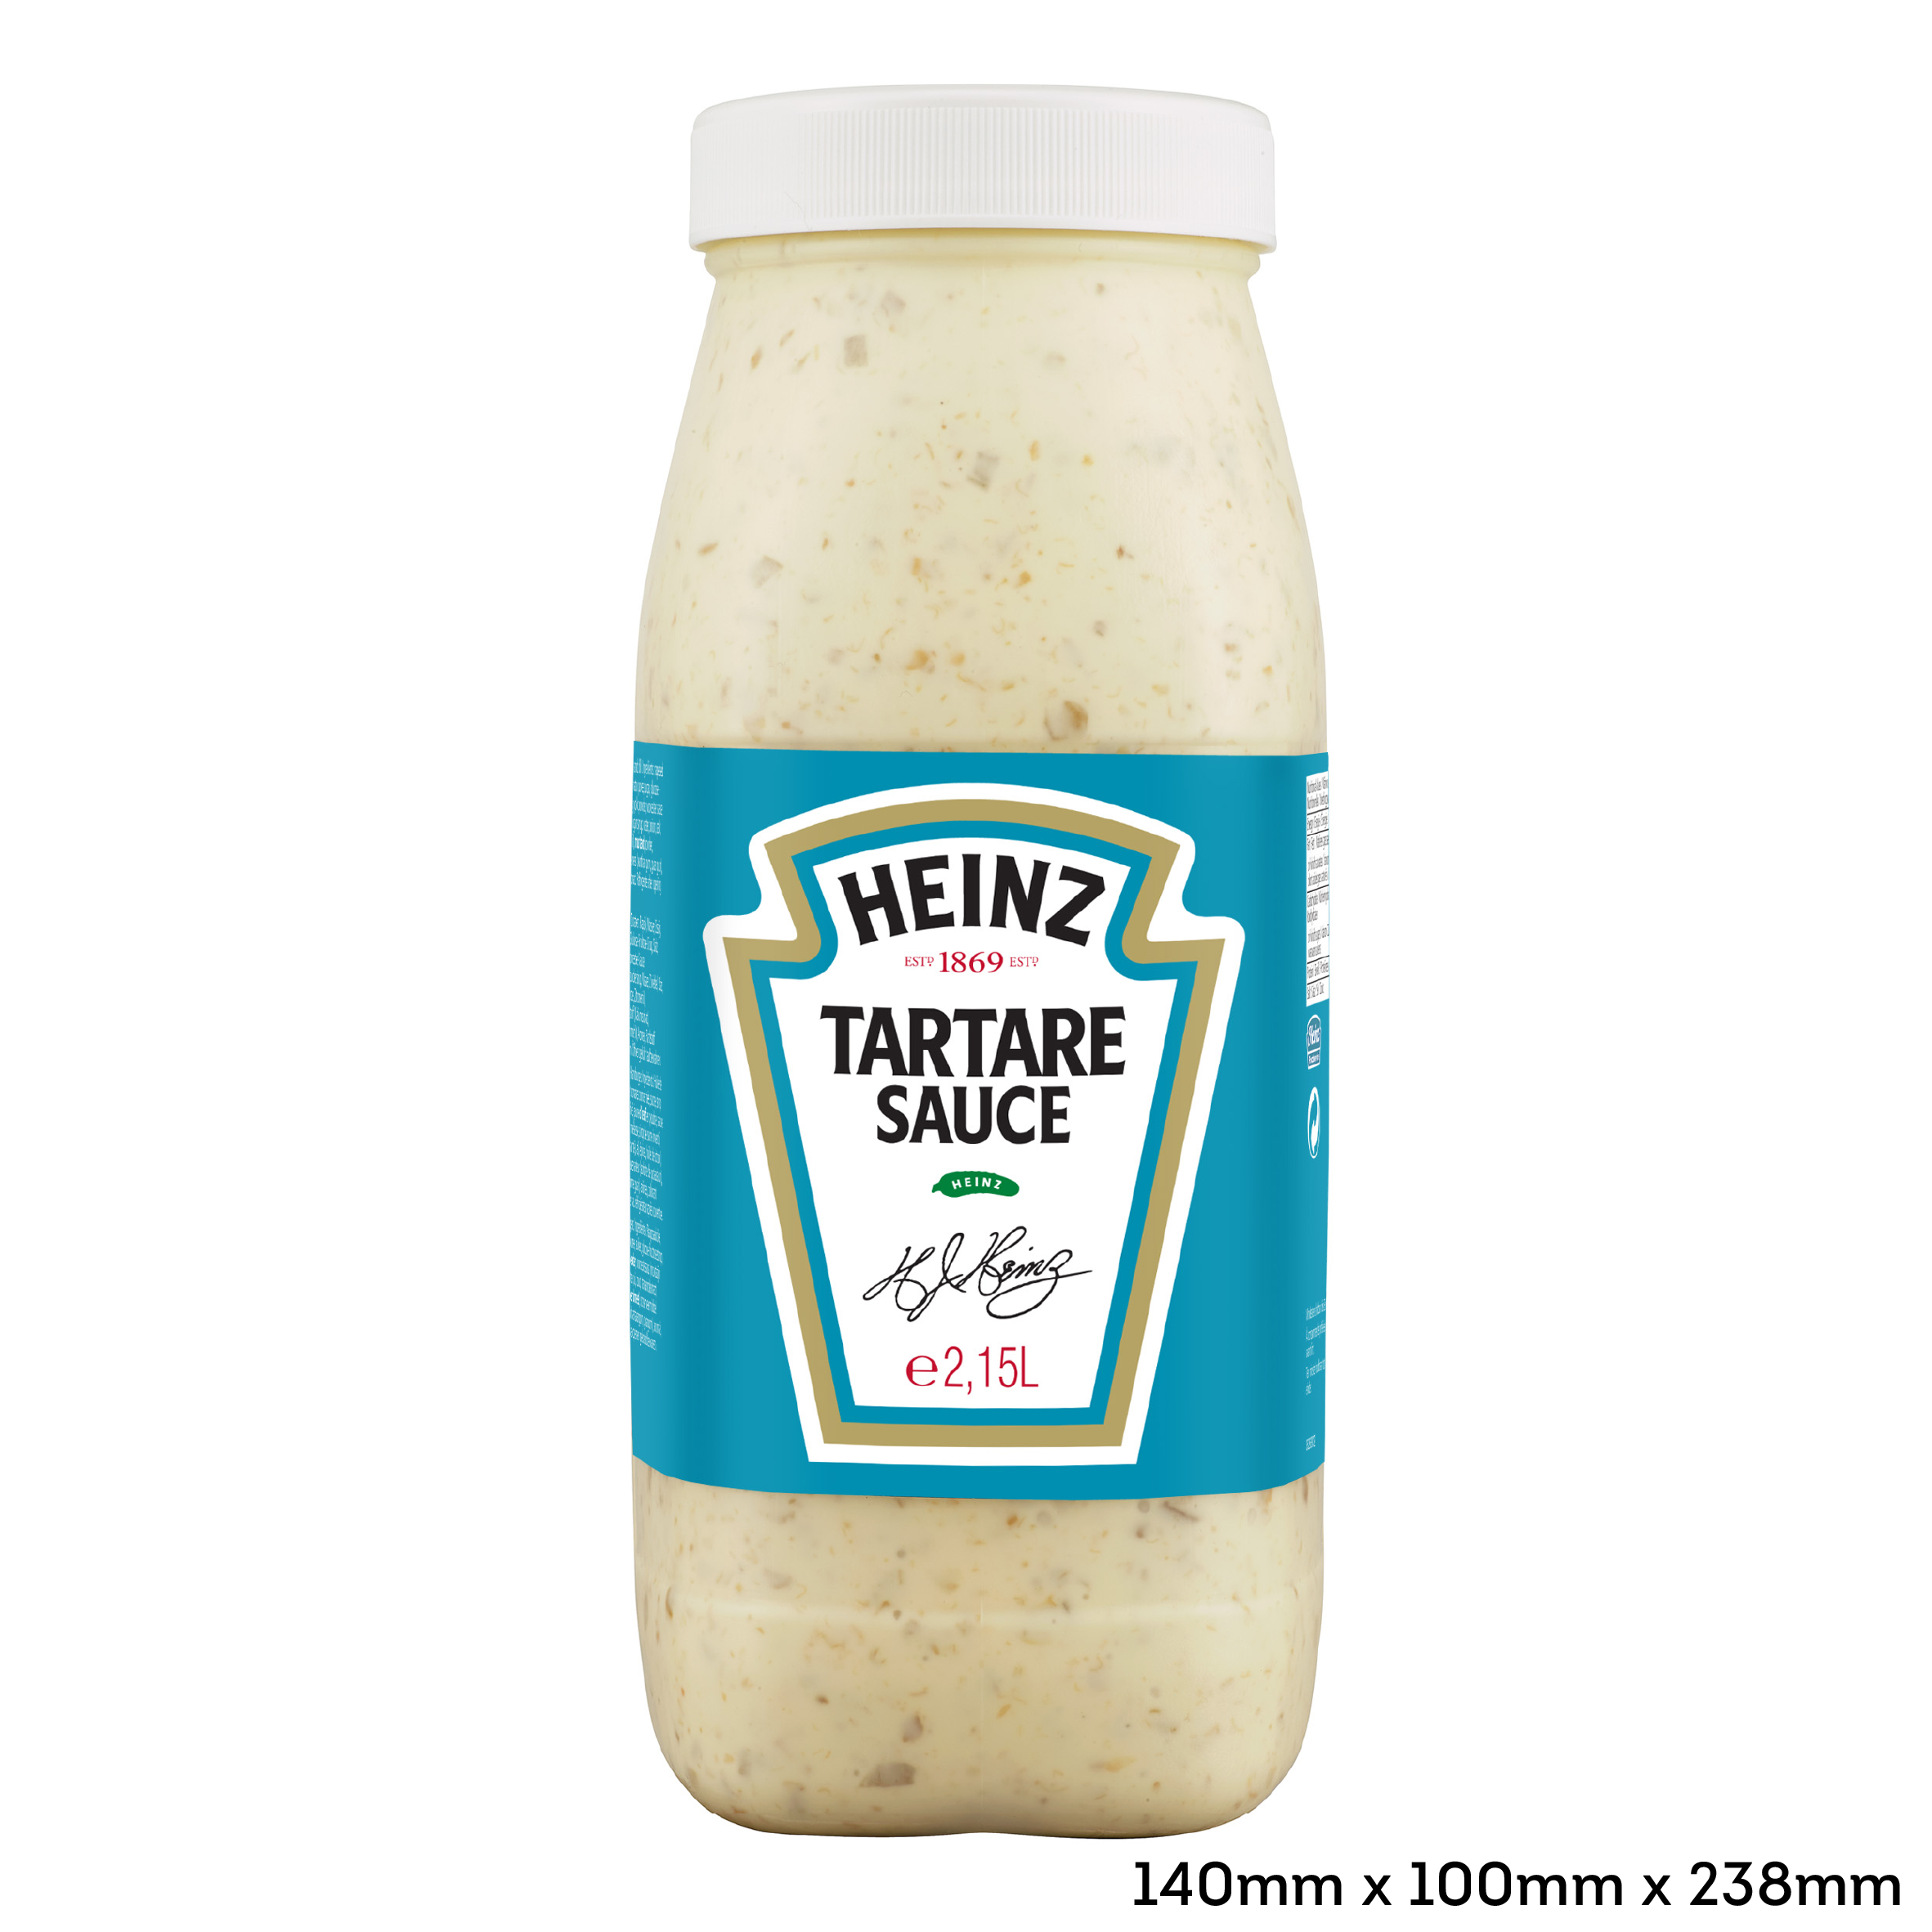 Heinz Tartare 2.15L Jars